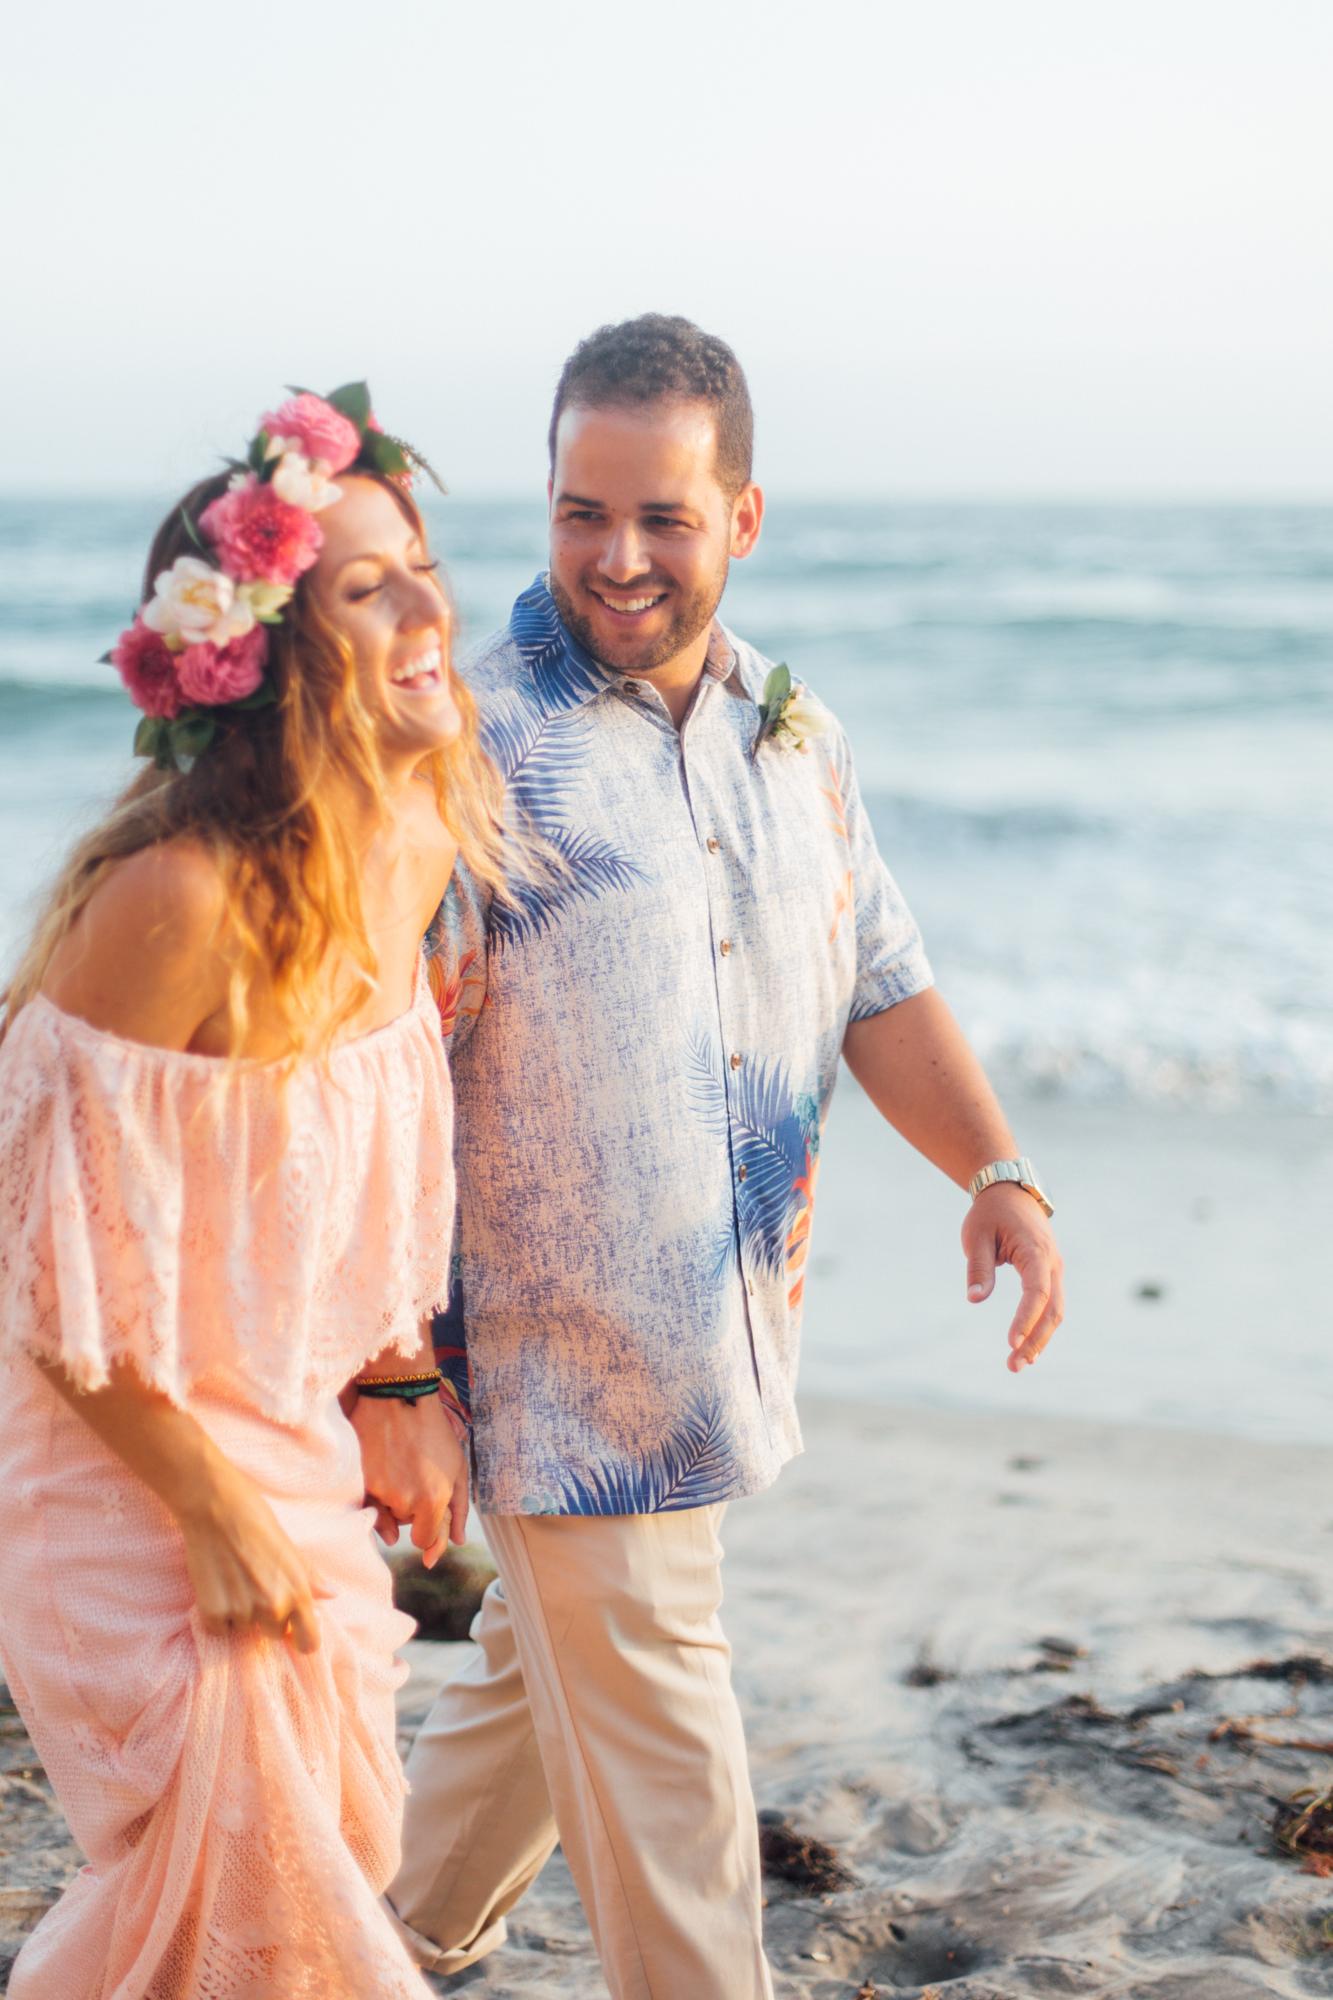 San Diego Wedding photography at Cardiff Beach044.jpg